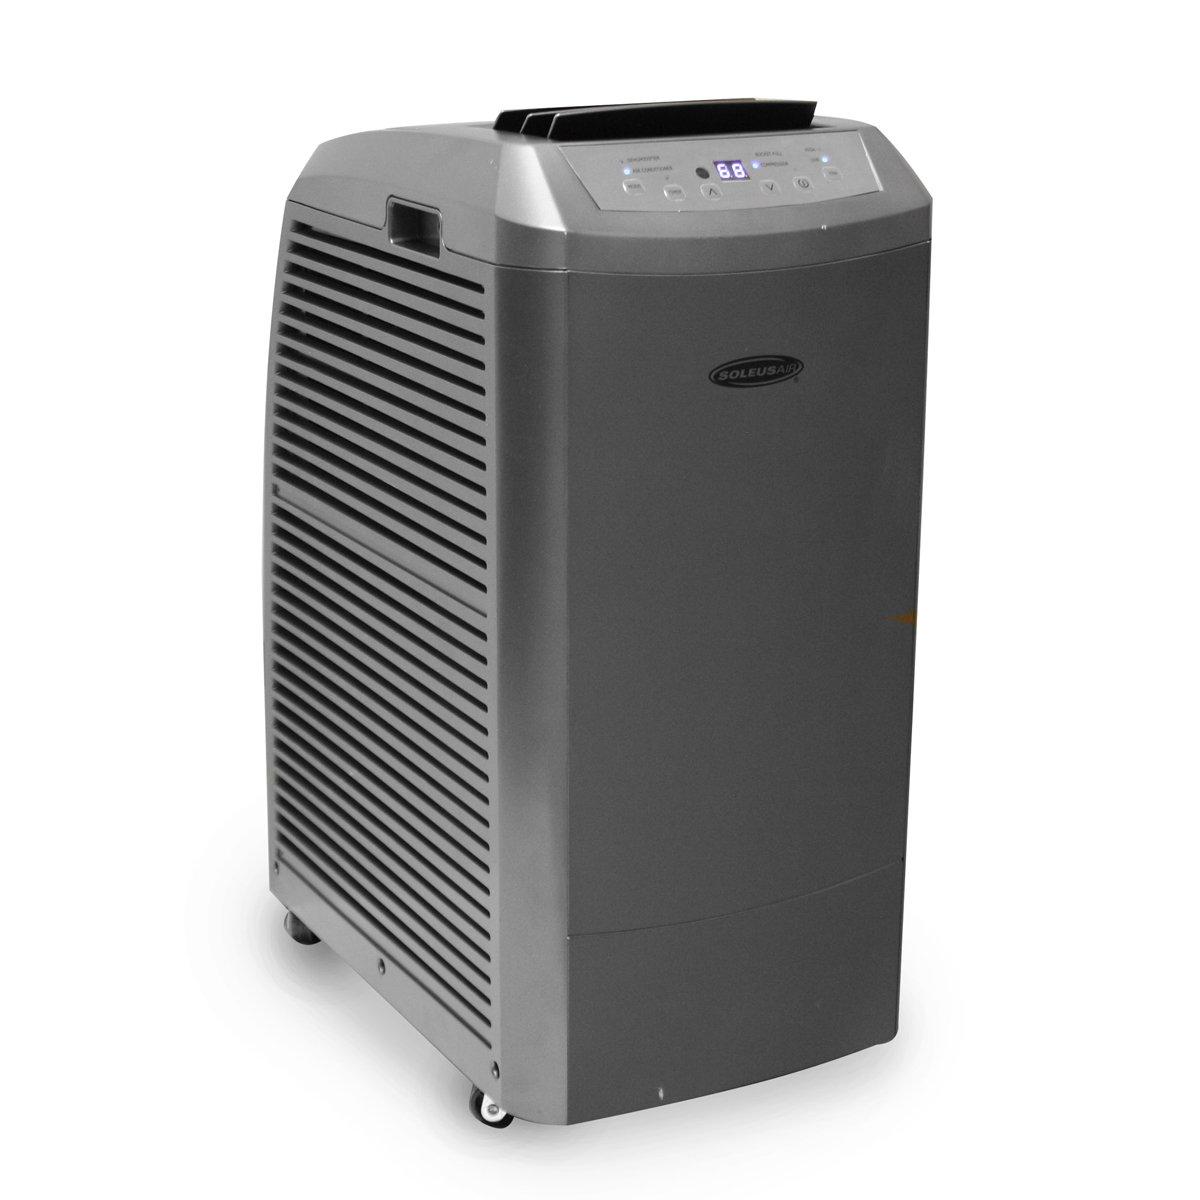 Soleus Air #BPA11, 11,000 BTU Portable Air Conditioner ...